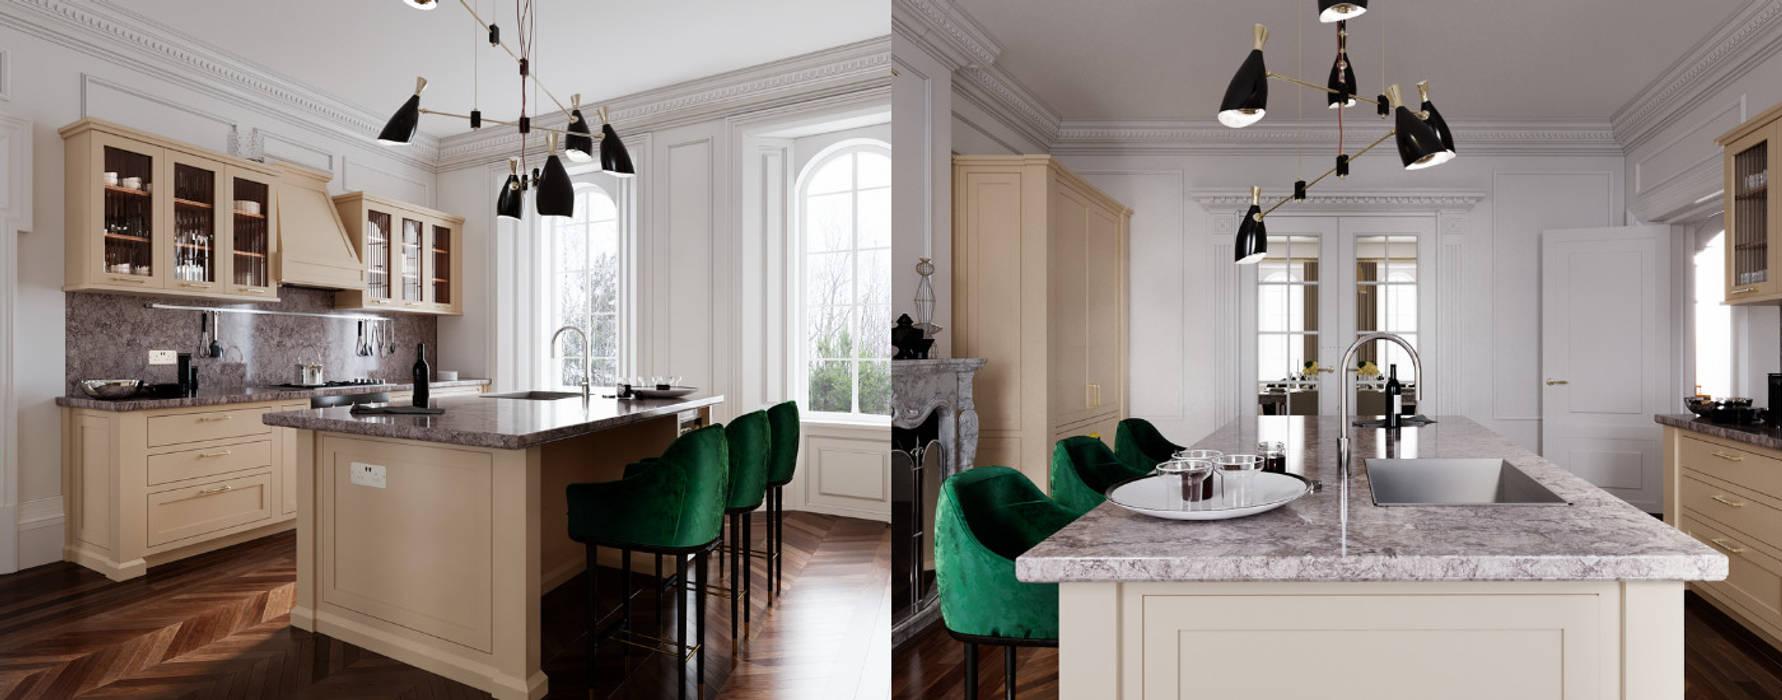 DelightFULL HouseholdAccessories & decoration Copper/Bronze/Brass Black